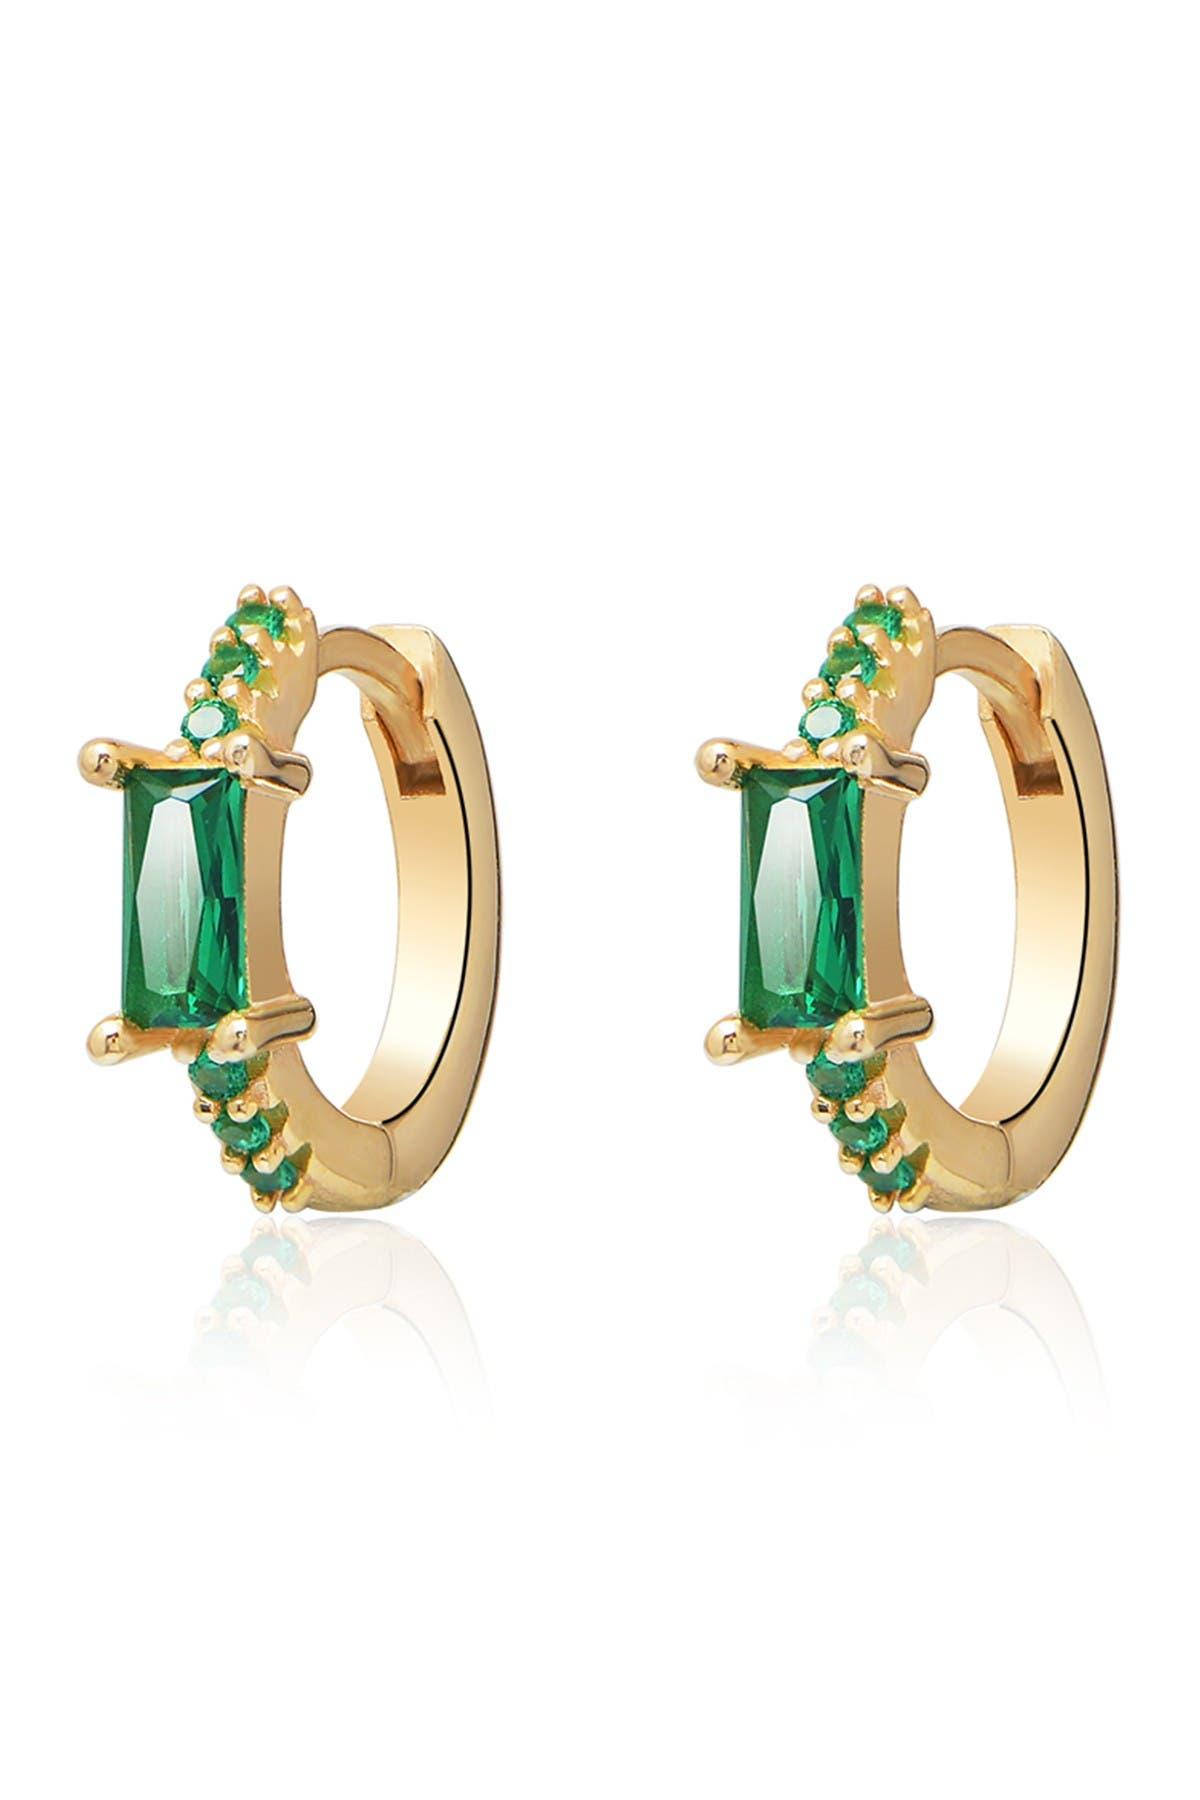 Image of Gabi Rielle Emerald Sparkle Huggie Earrings